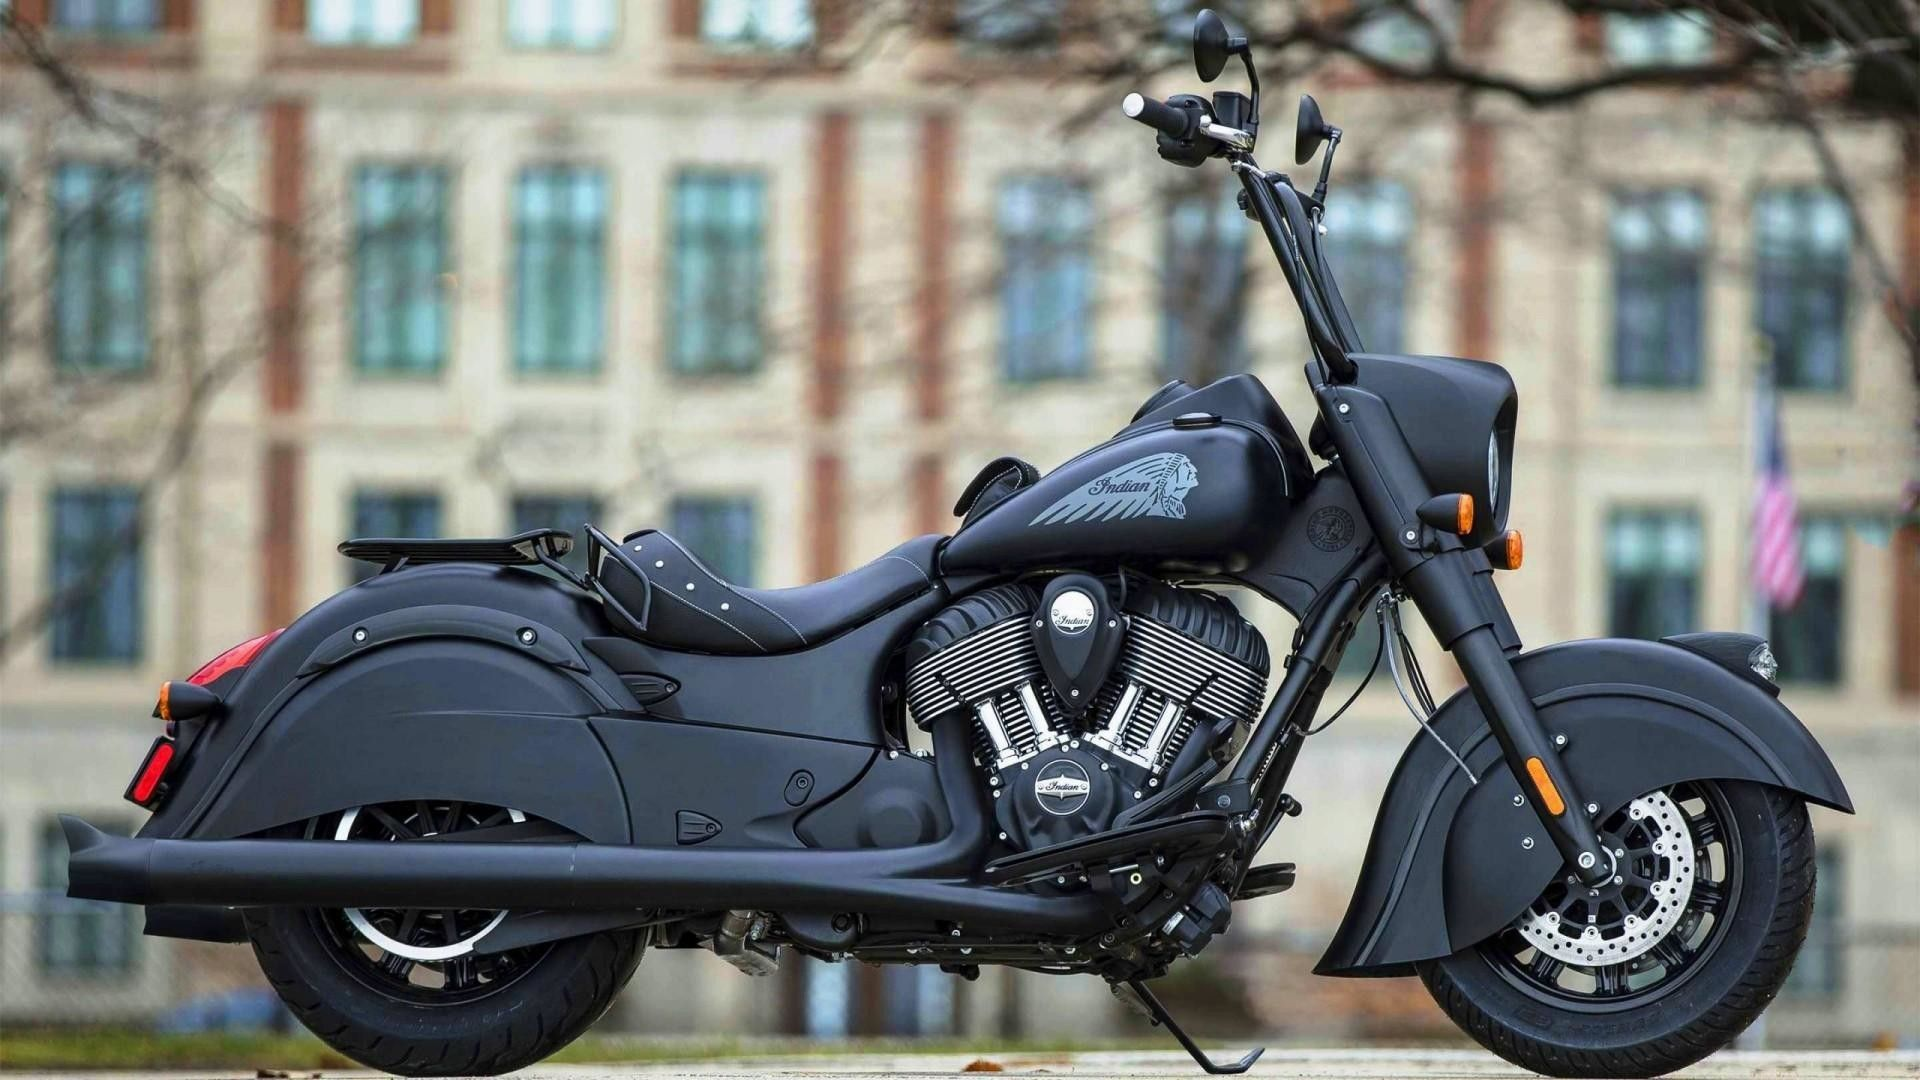 Res 1920x1080 Indian Dark Horse Motorcycle Wallpaper Bobber